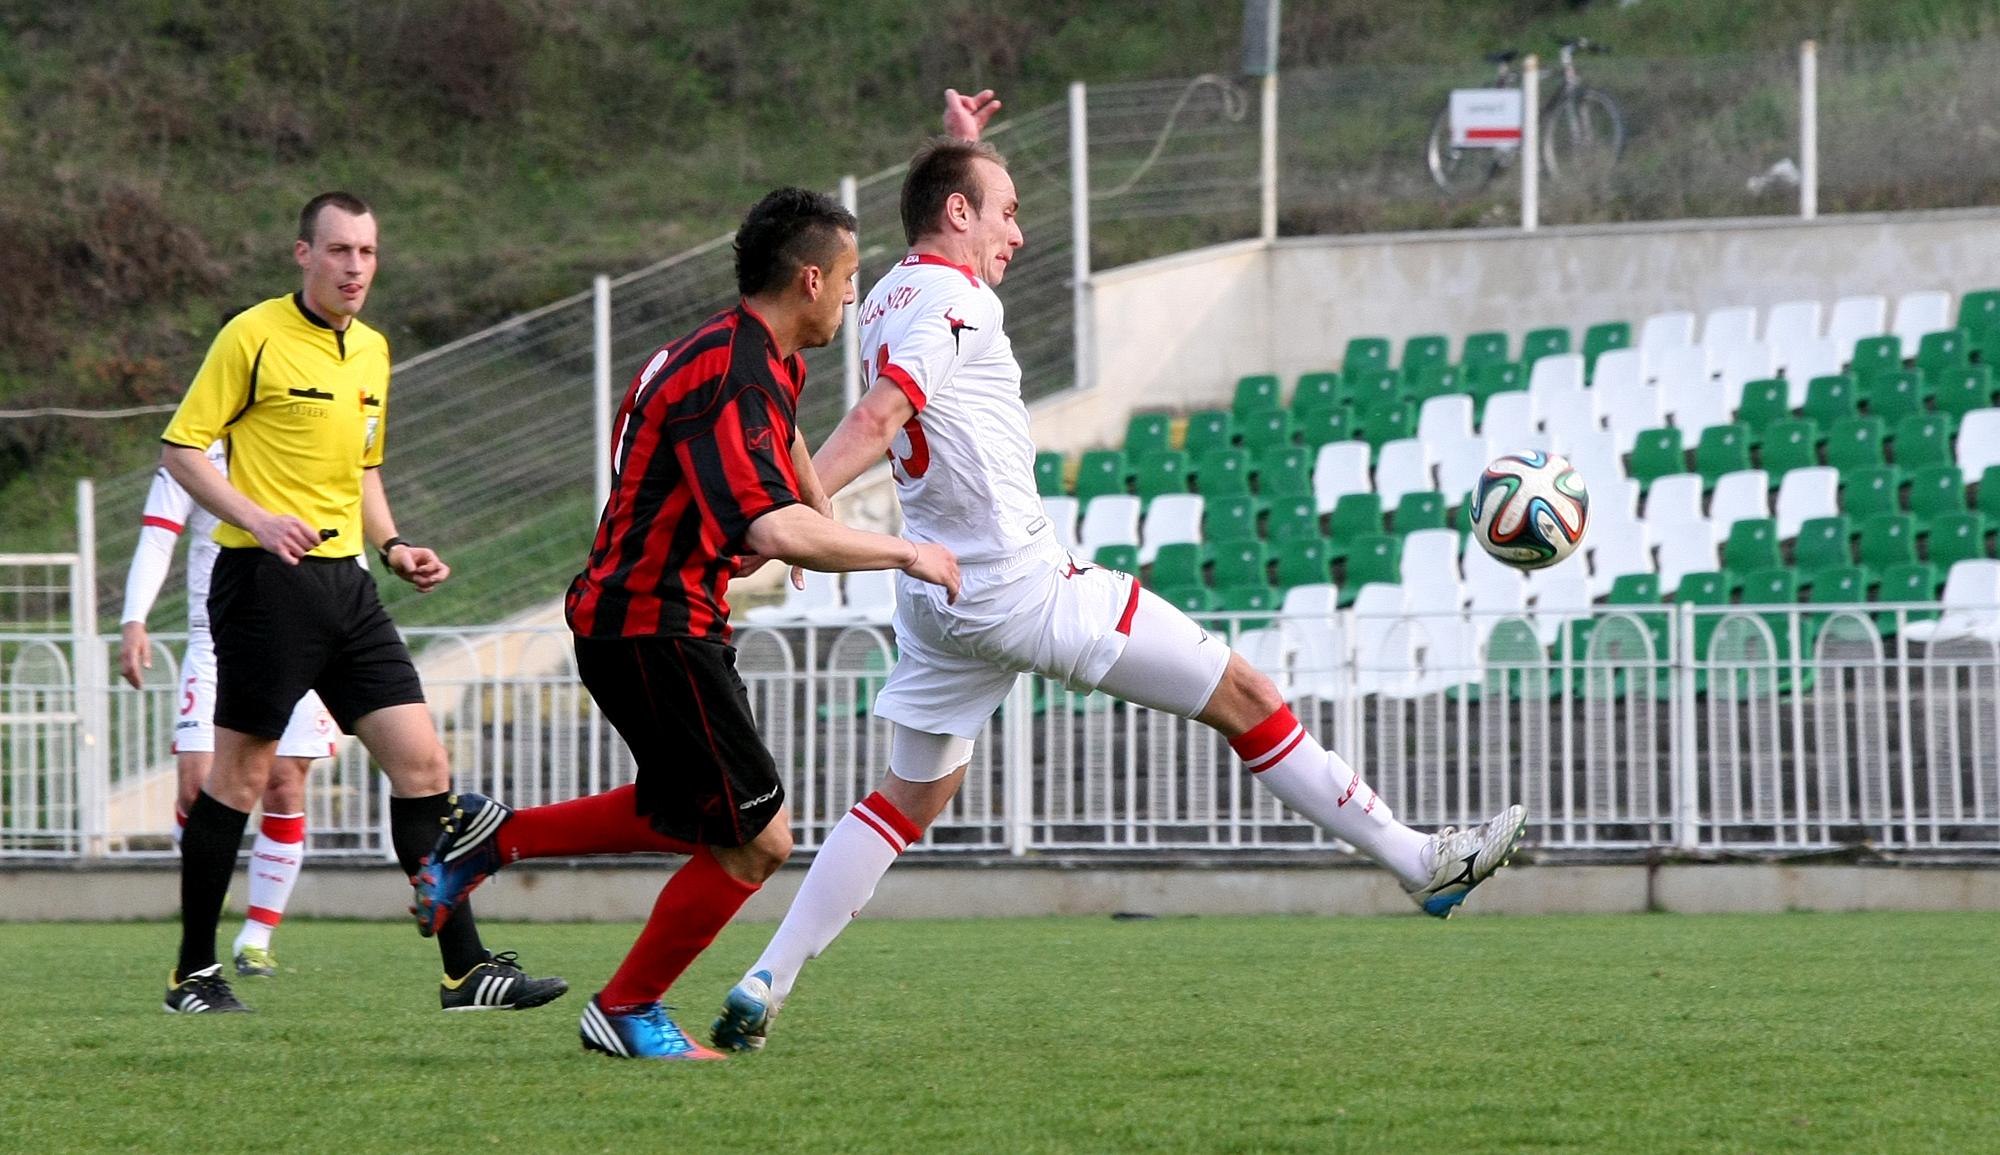 Локомотив (Мз) - ЦСКА 0:5